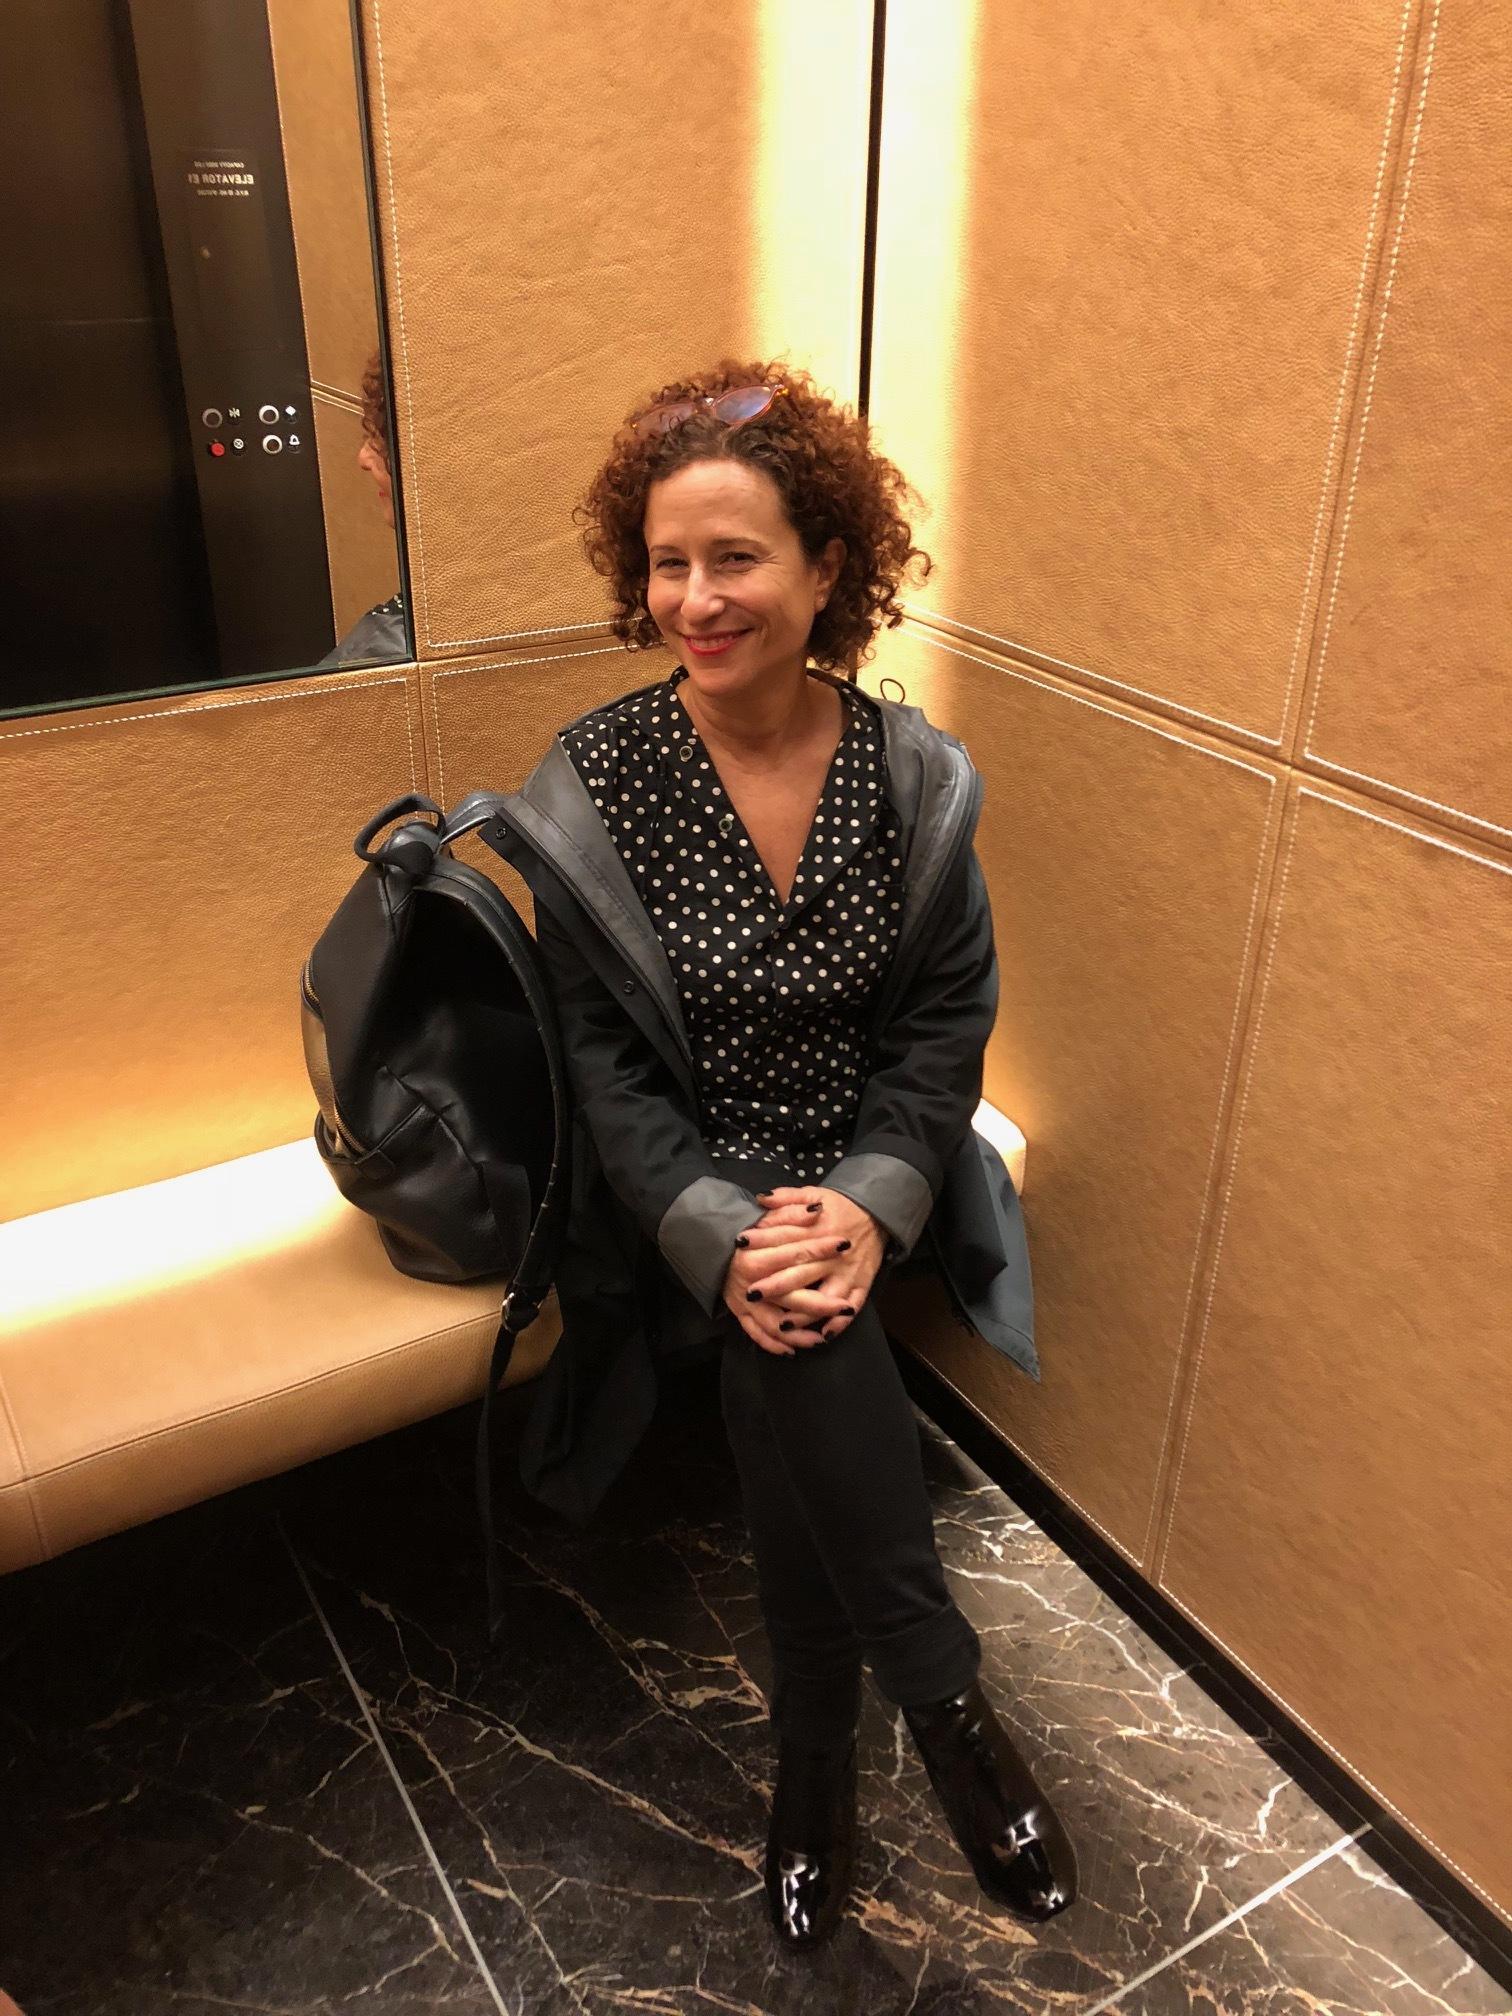 Team member Joan Schaffer tries the elevator bench in 432 Park